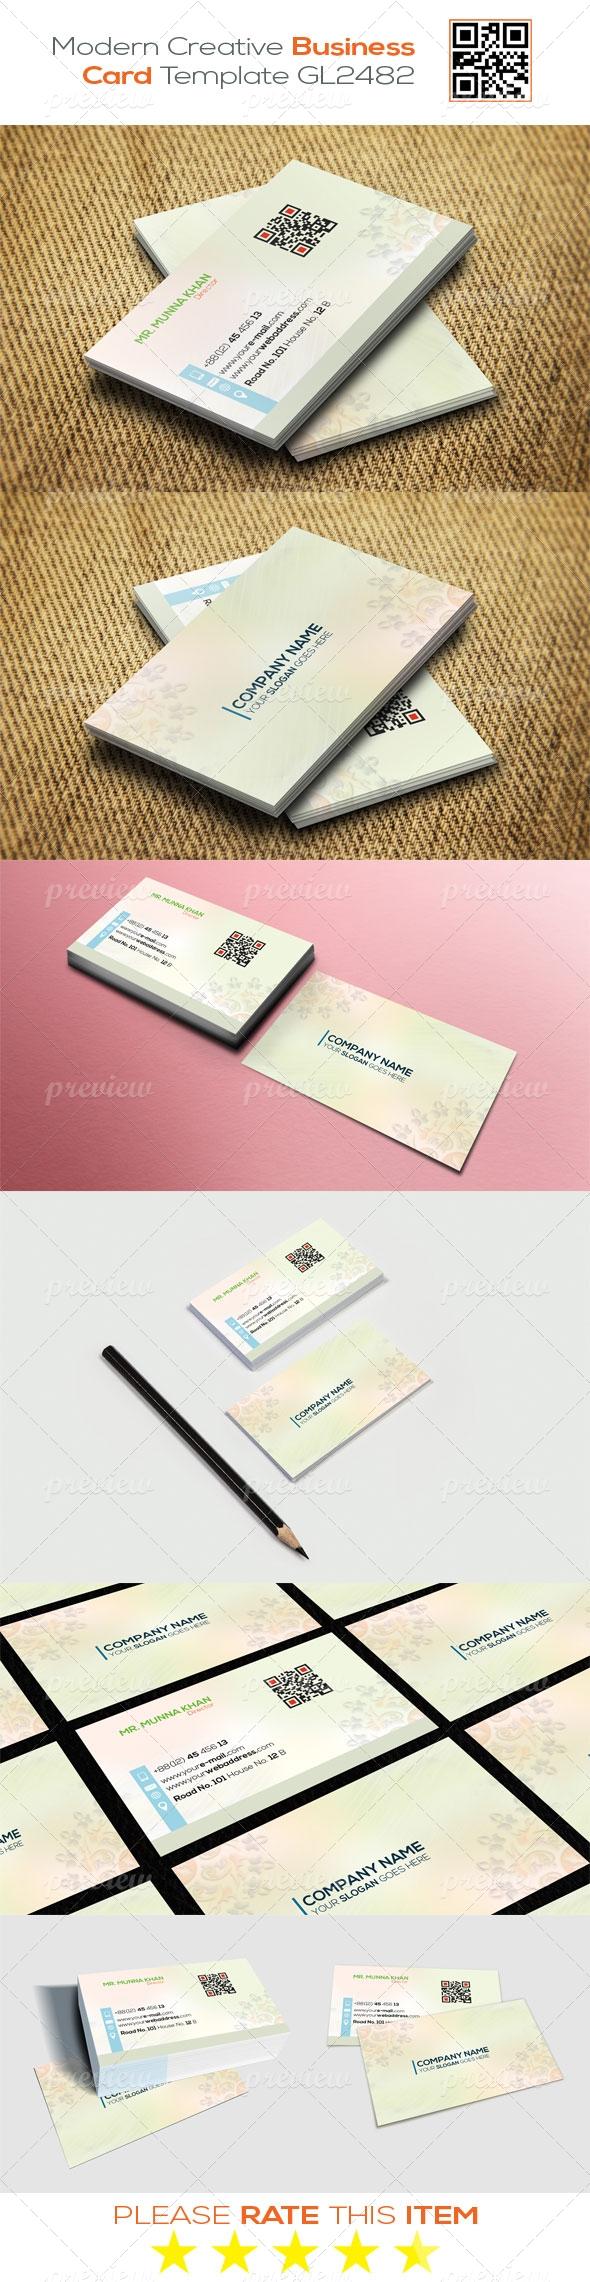 Modern Creative Business Card Template GL2482